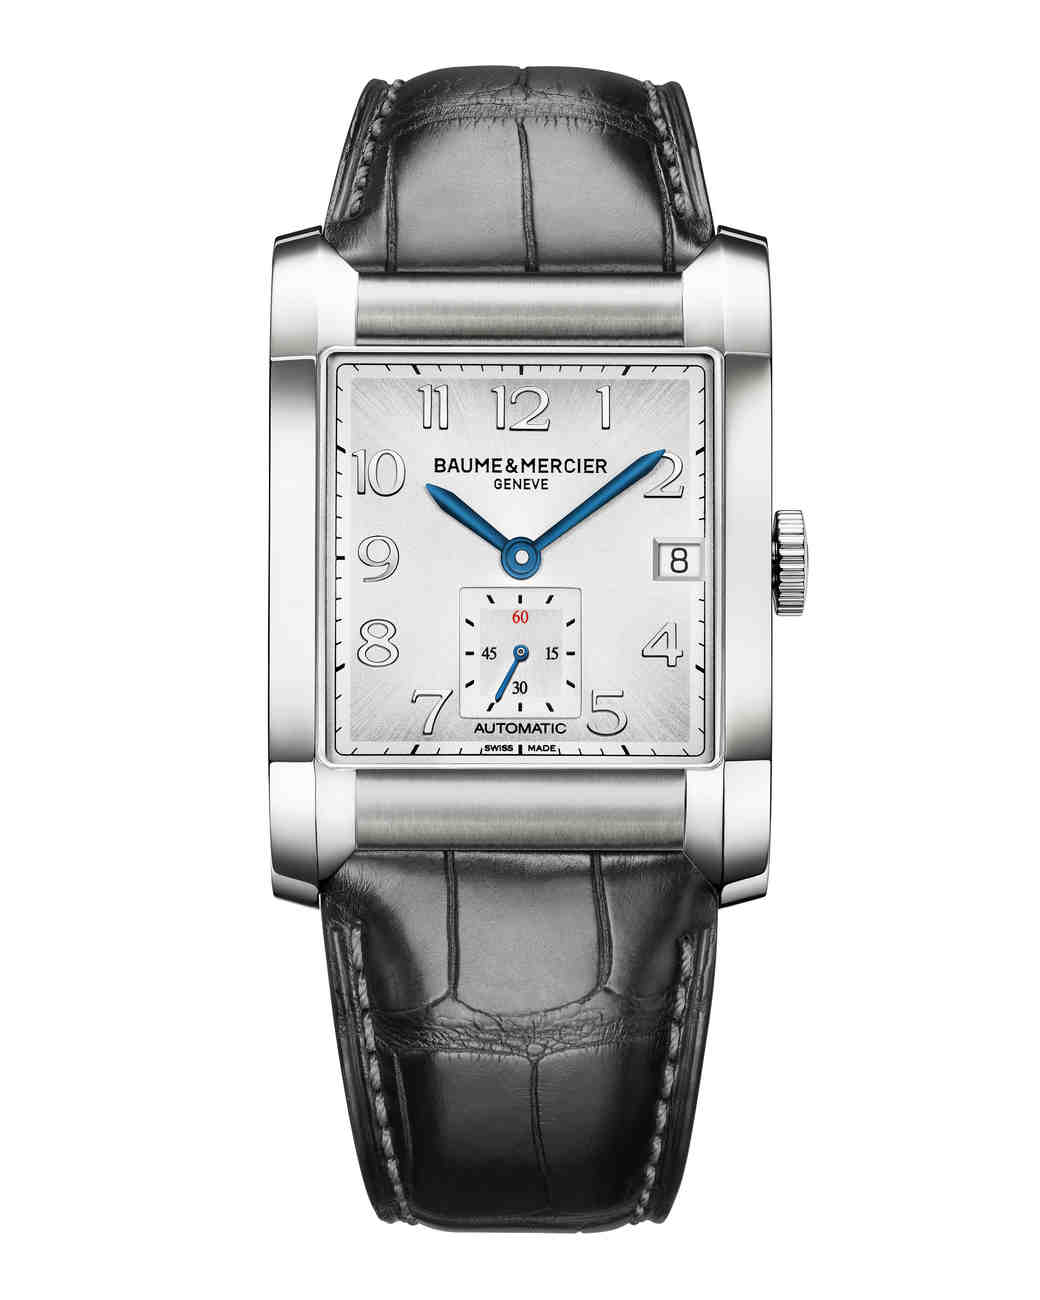 baume-mercier-watch-hampton-10026-0514.jpg